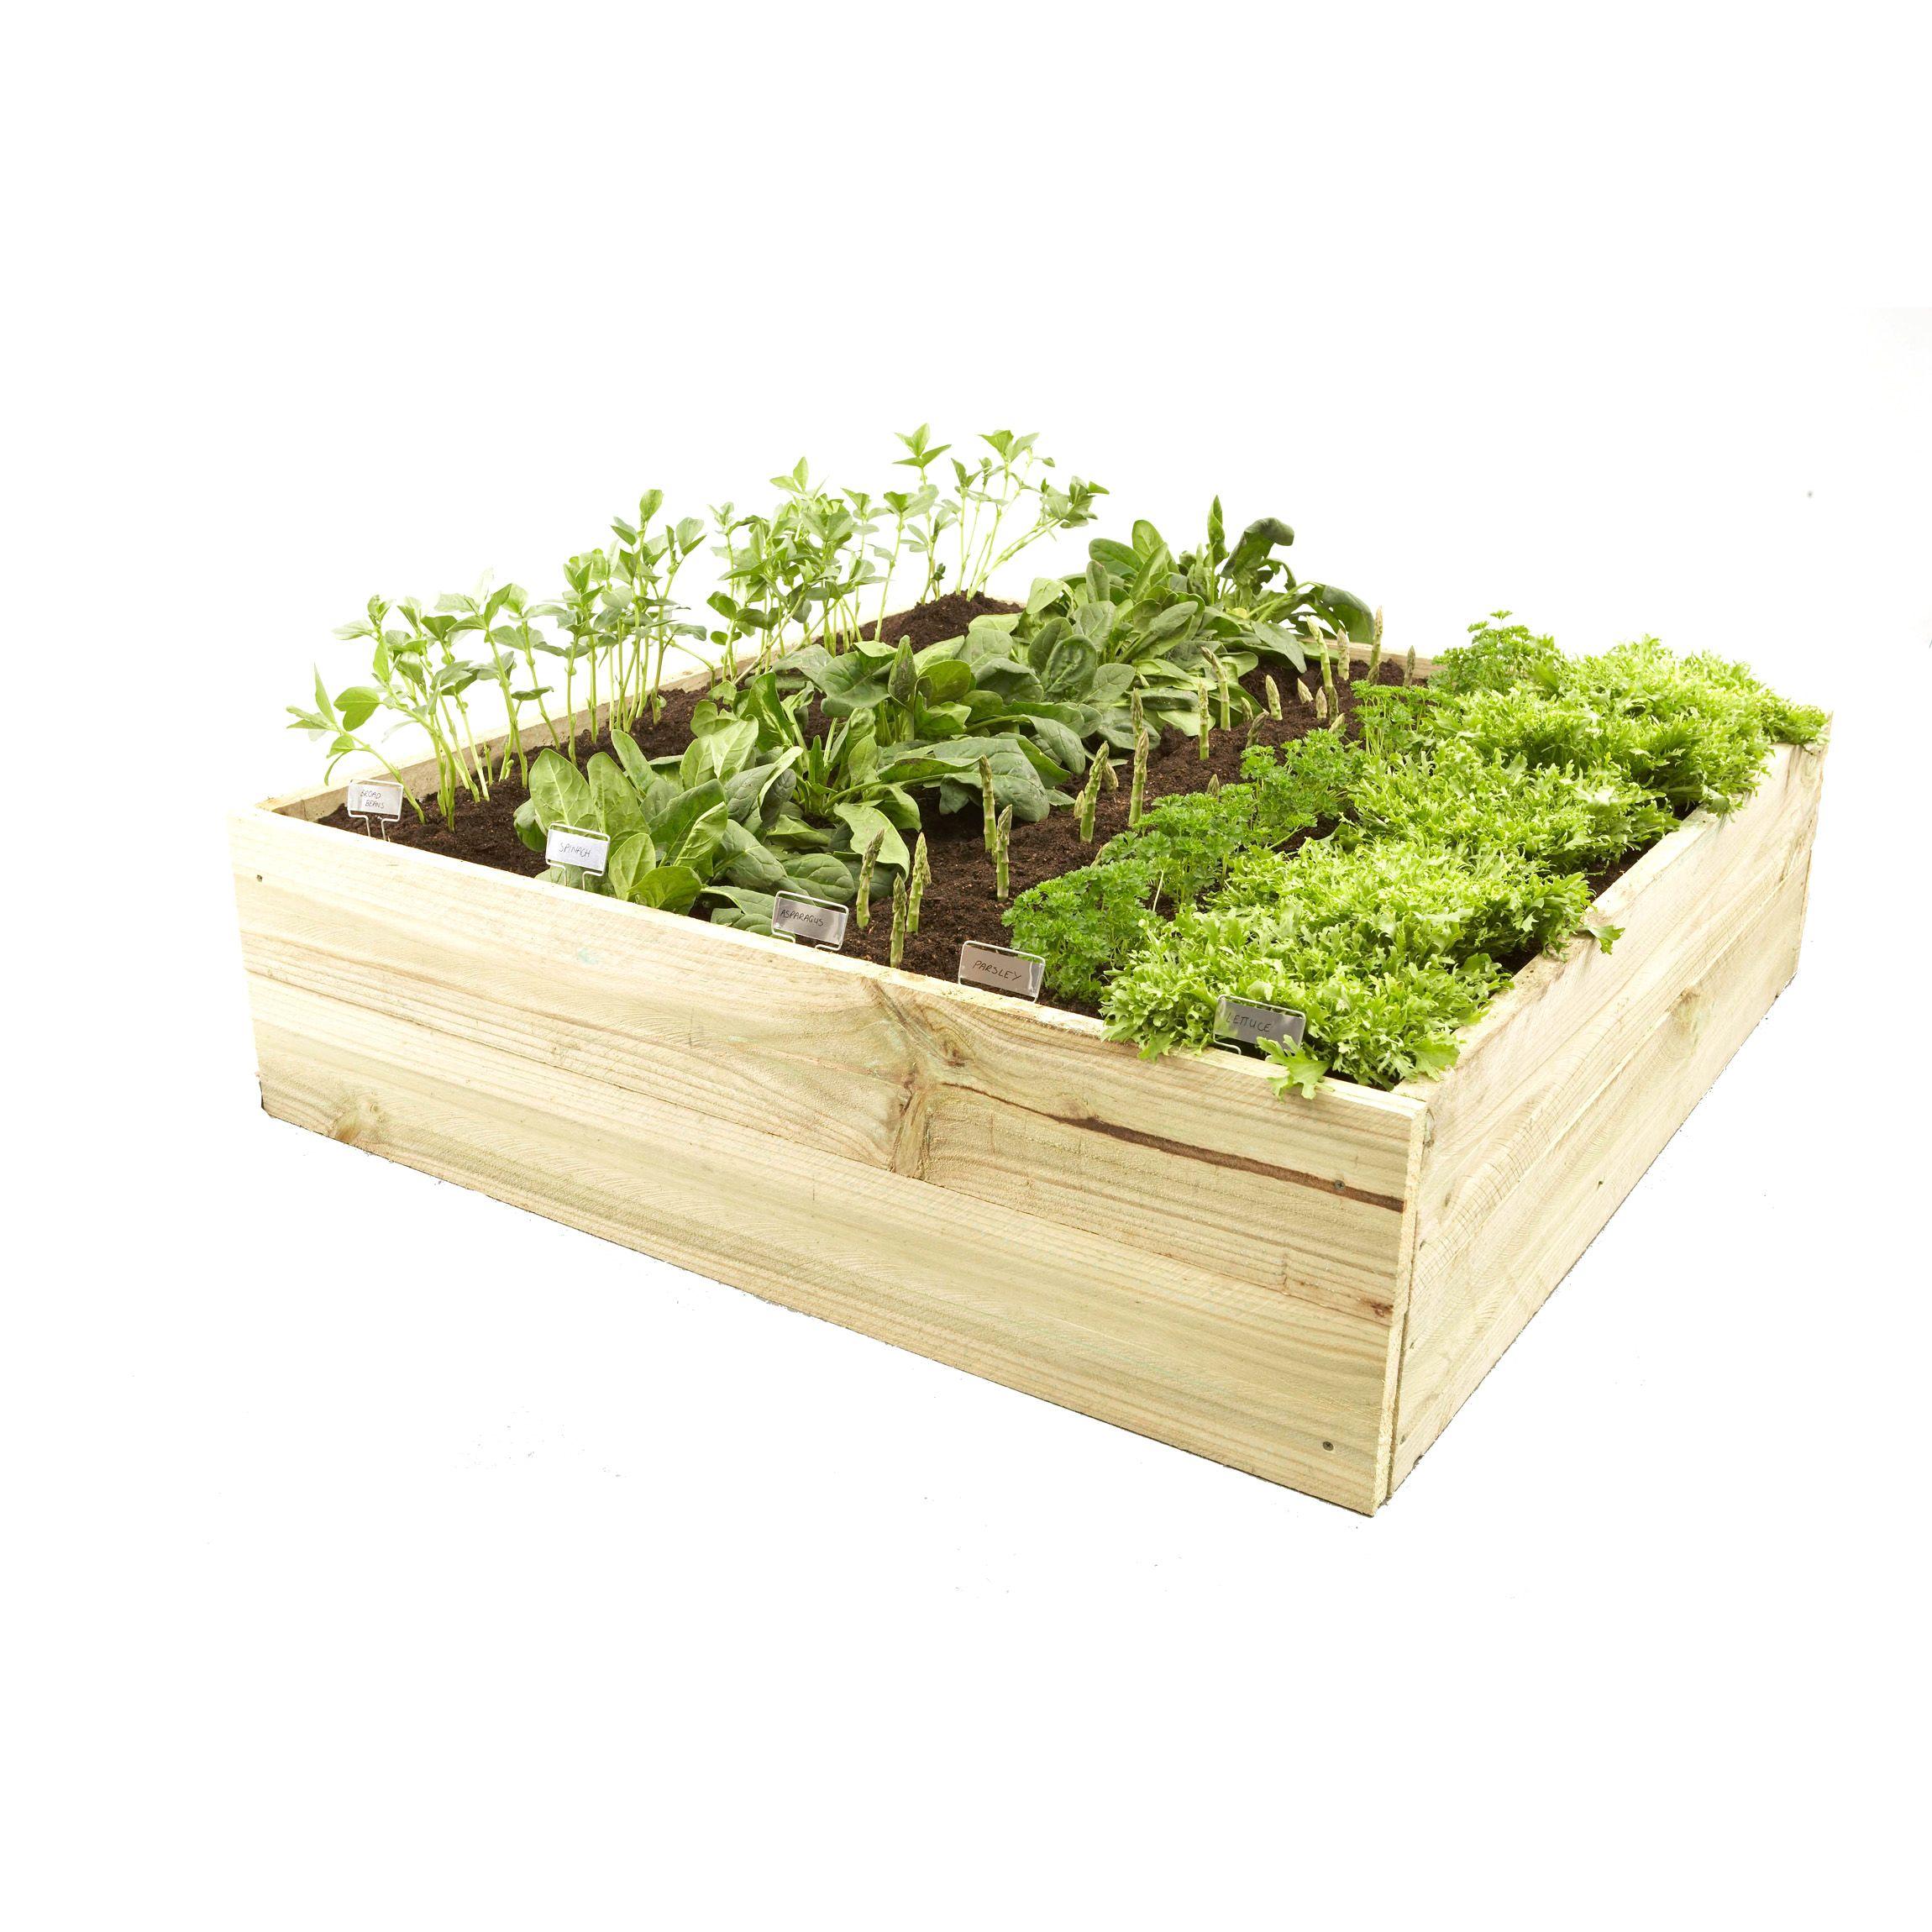 Lotus Treated Pine Raised Timber Garden Bed